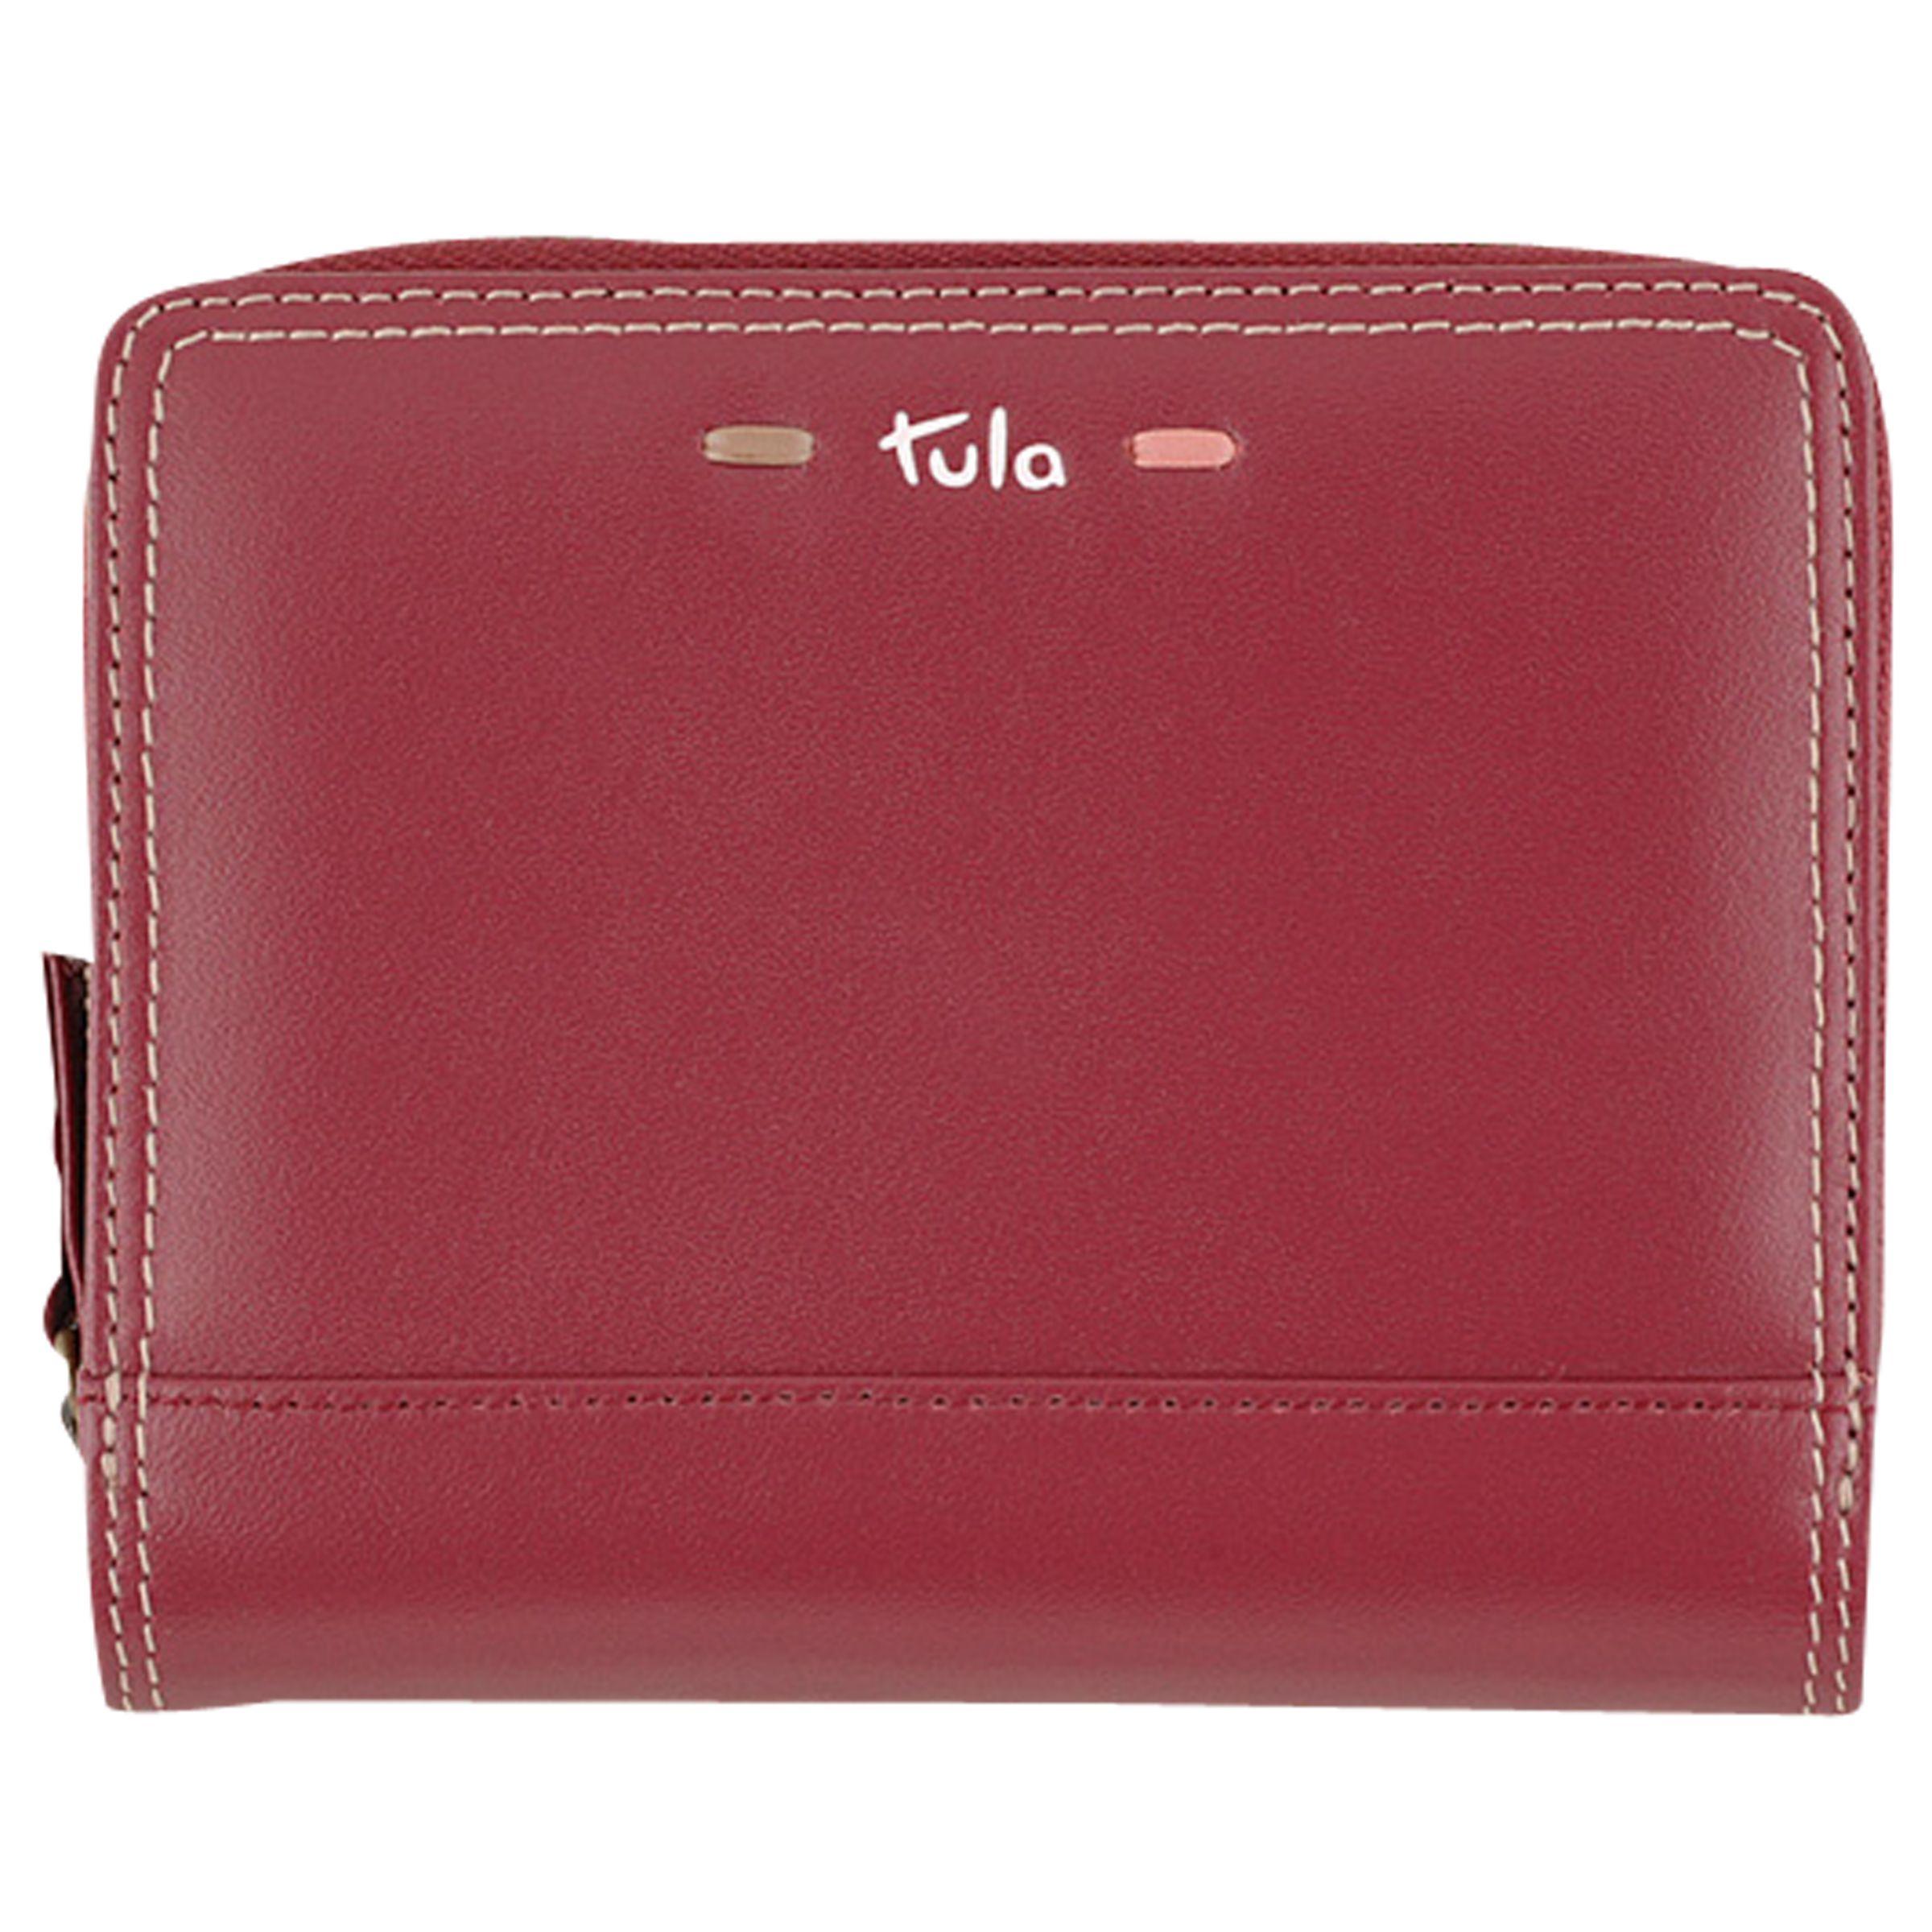 Tula Tula Violet Leather Wallet Purse